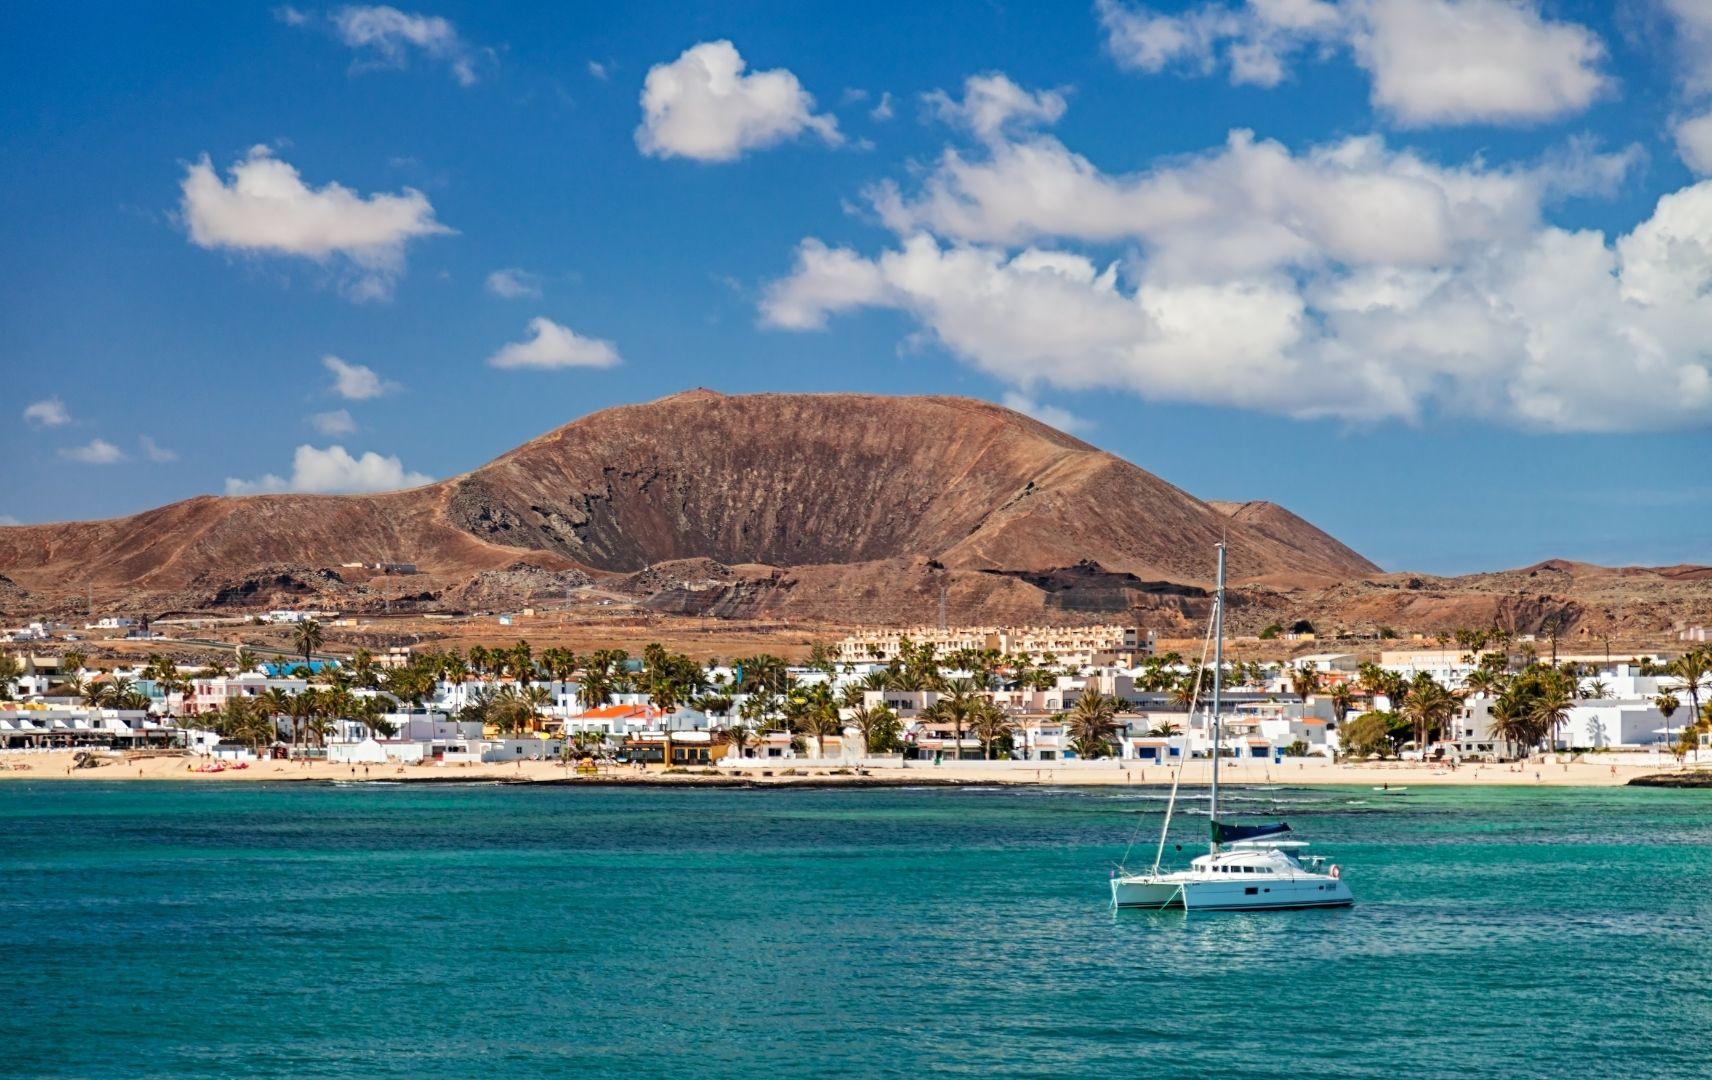 Reiseziel Spanien - Fuerteventura Strandbild